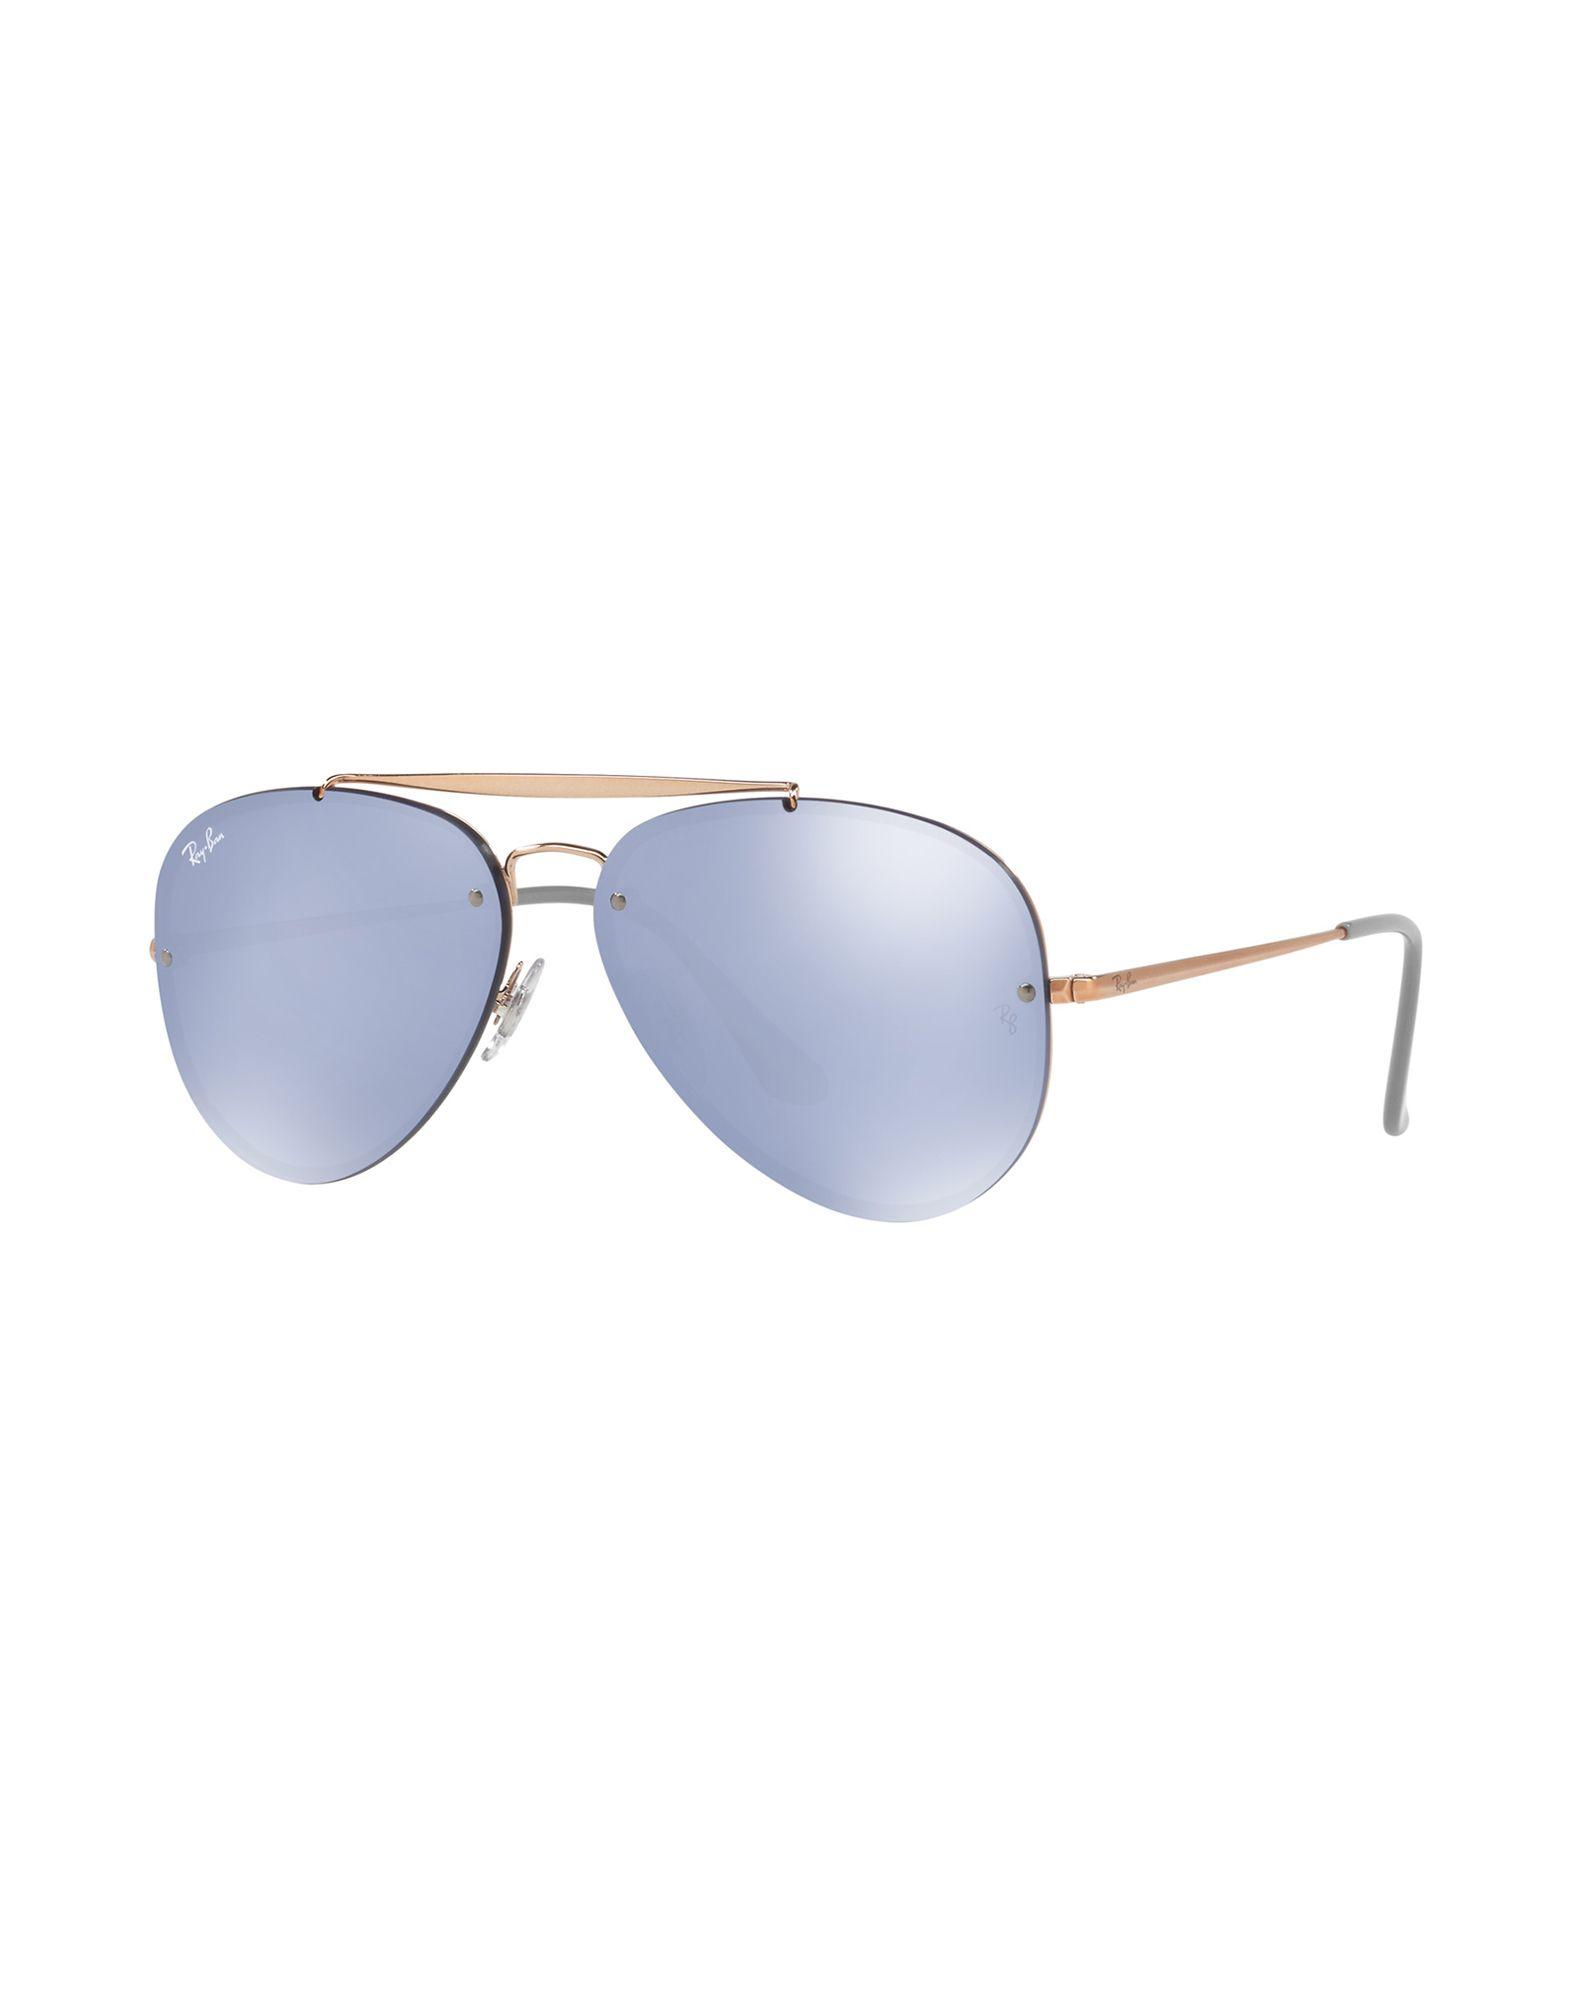 Occhiali Da Sole Ray-Ban Rb3584n - Uomo - Acquista online su